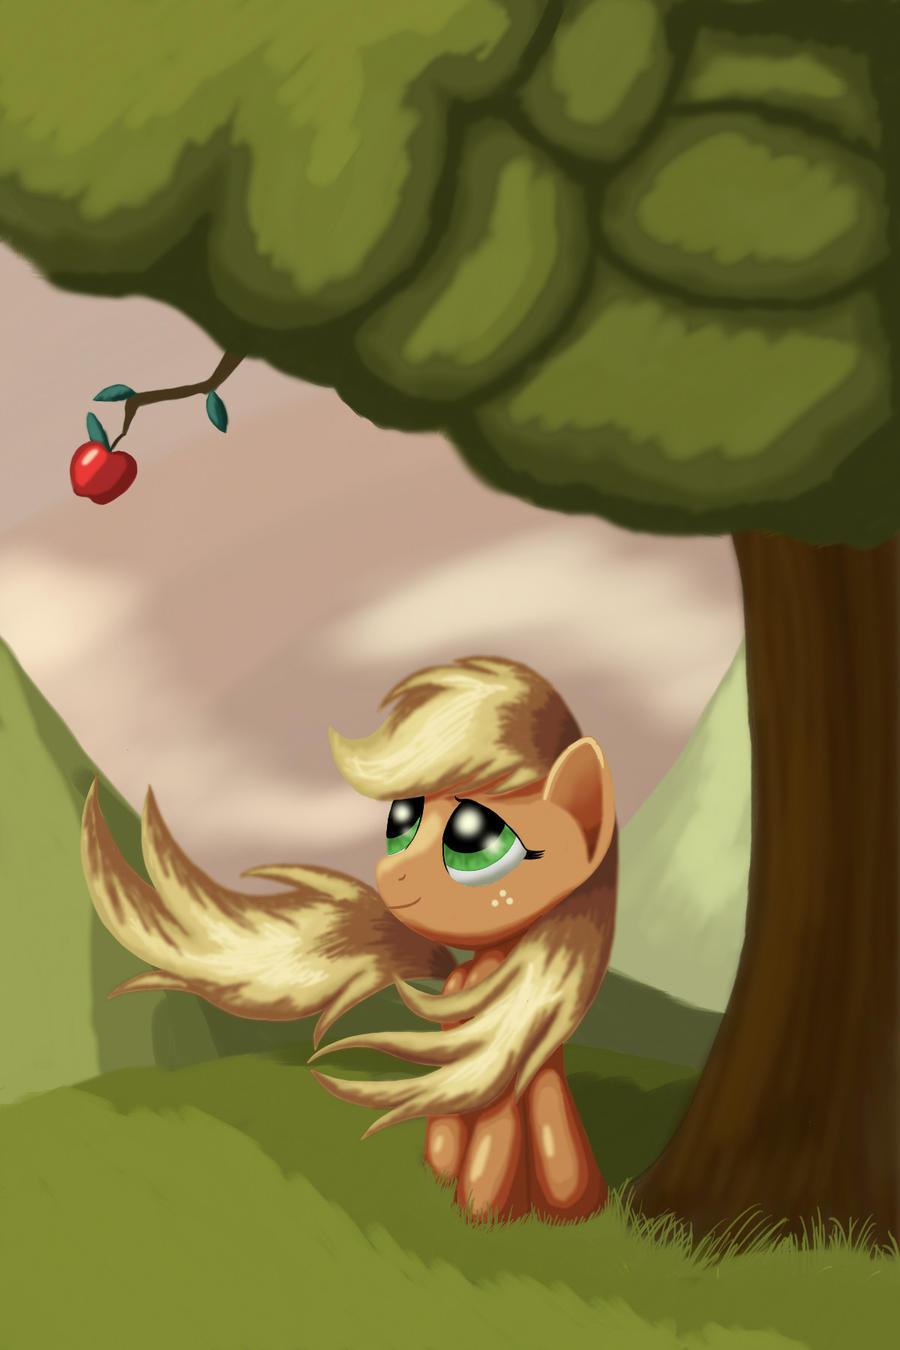 Last Apple by Grennadder